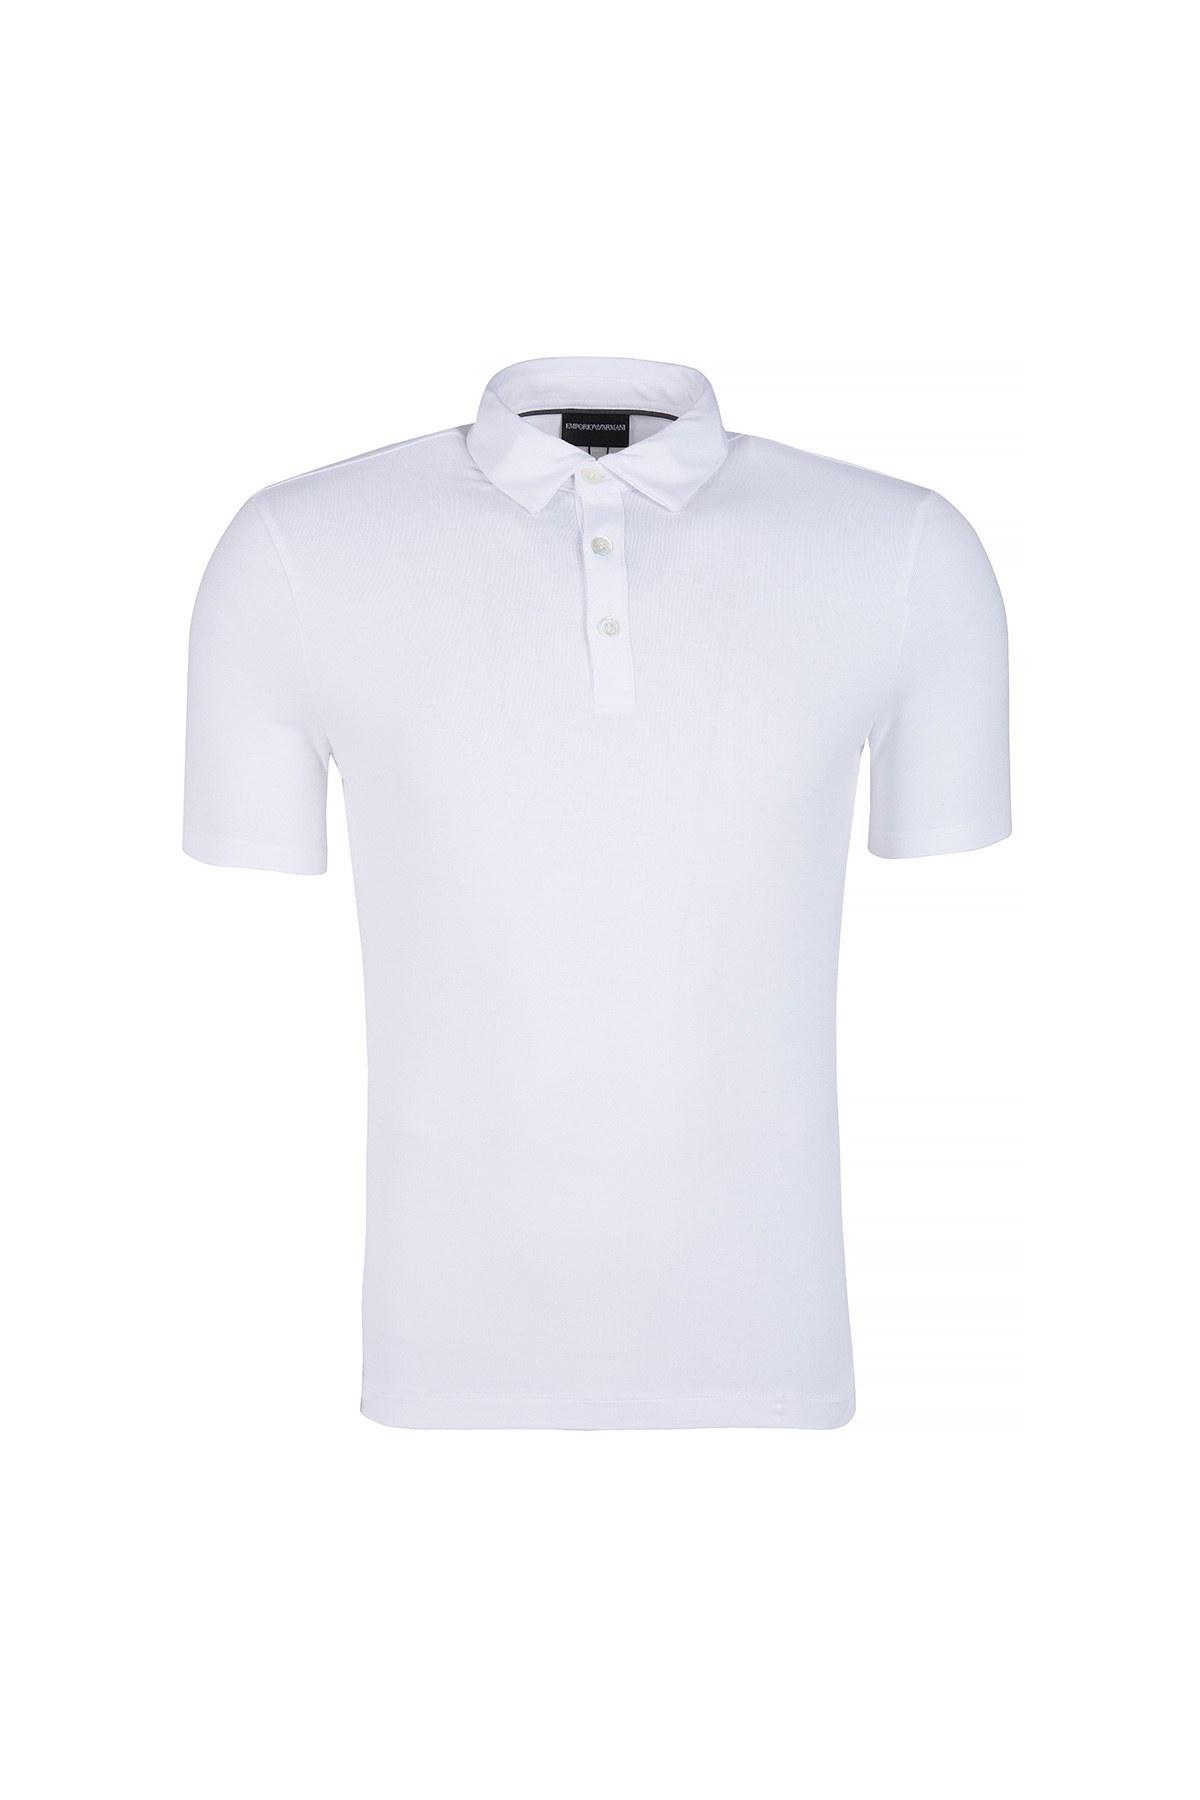 EMPORIO ARMANI T SHIRT Erkek T Shirt 8N1F8C 1JCDZ BEYAZ